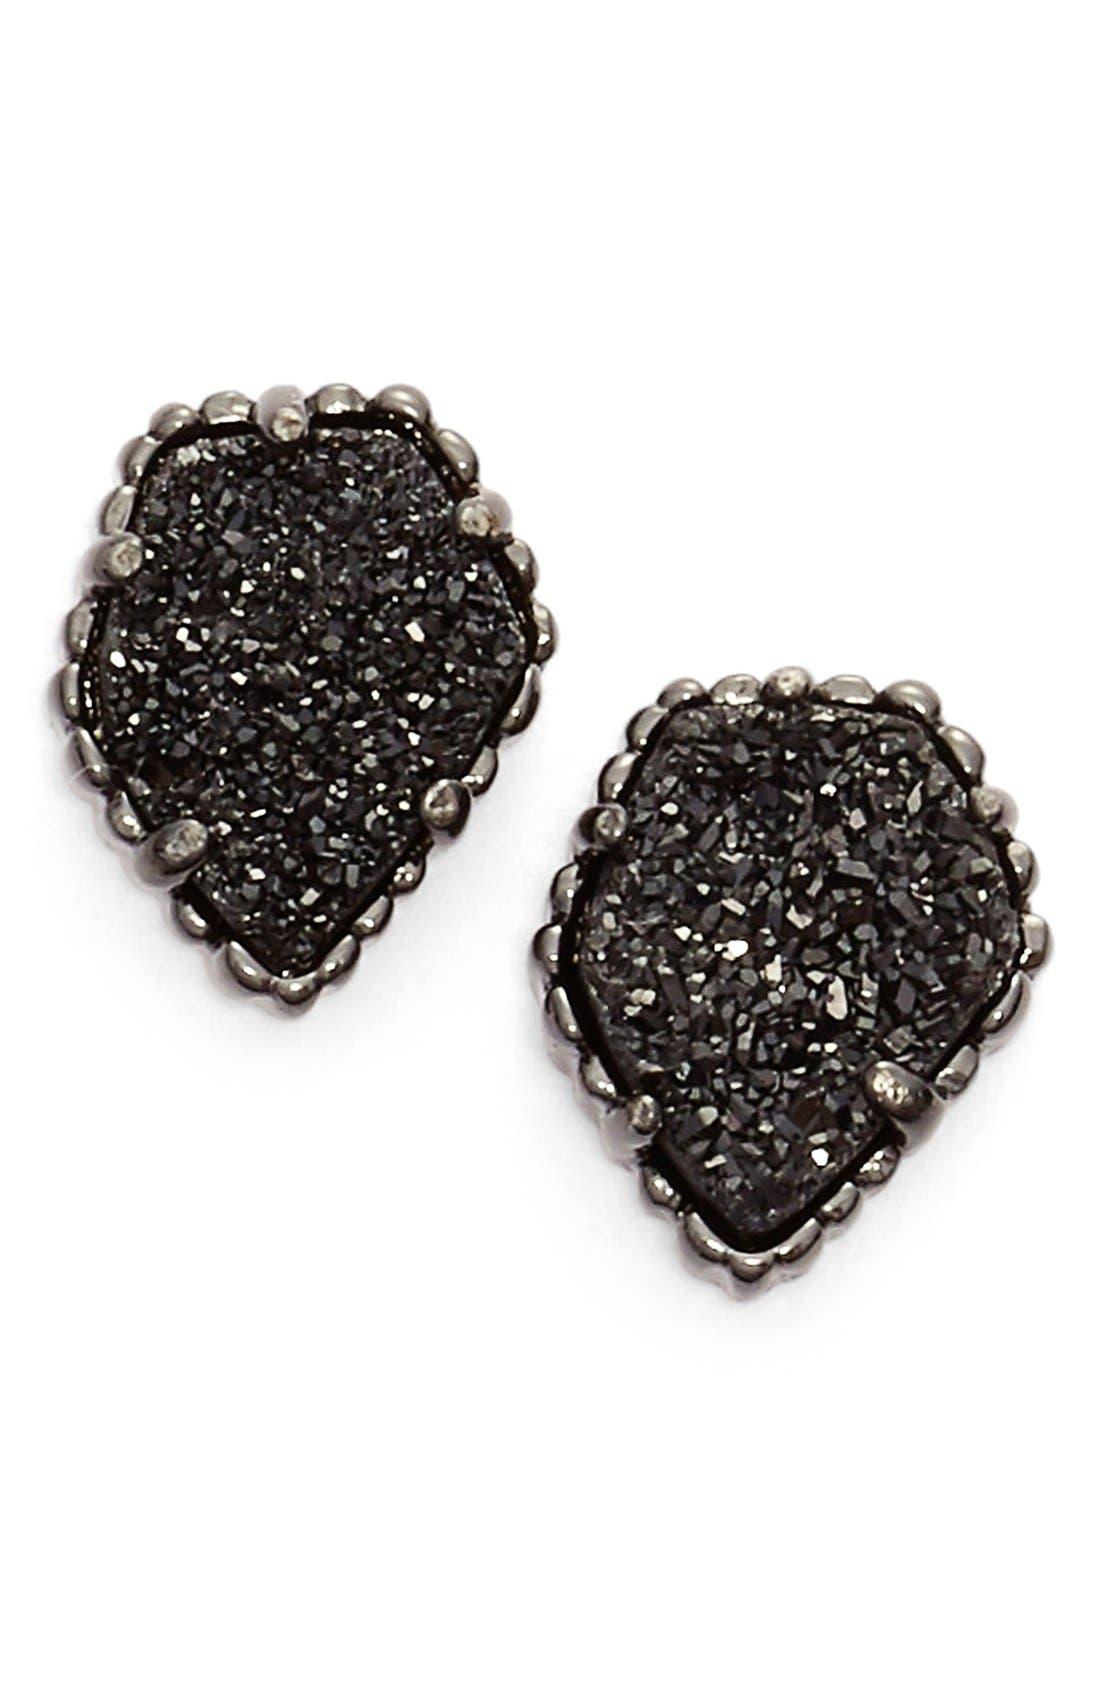 Tessa Stone Stud Earrings,                             Main thumbnail 1, color,                             Black Drusy/ Gunmetal